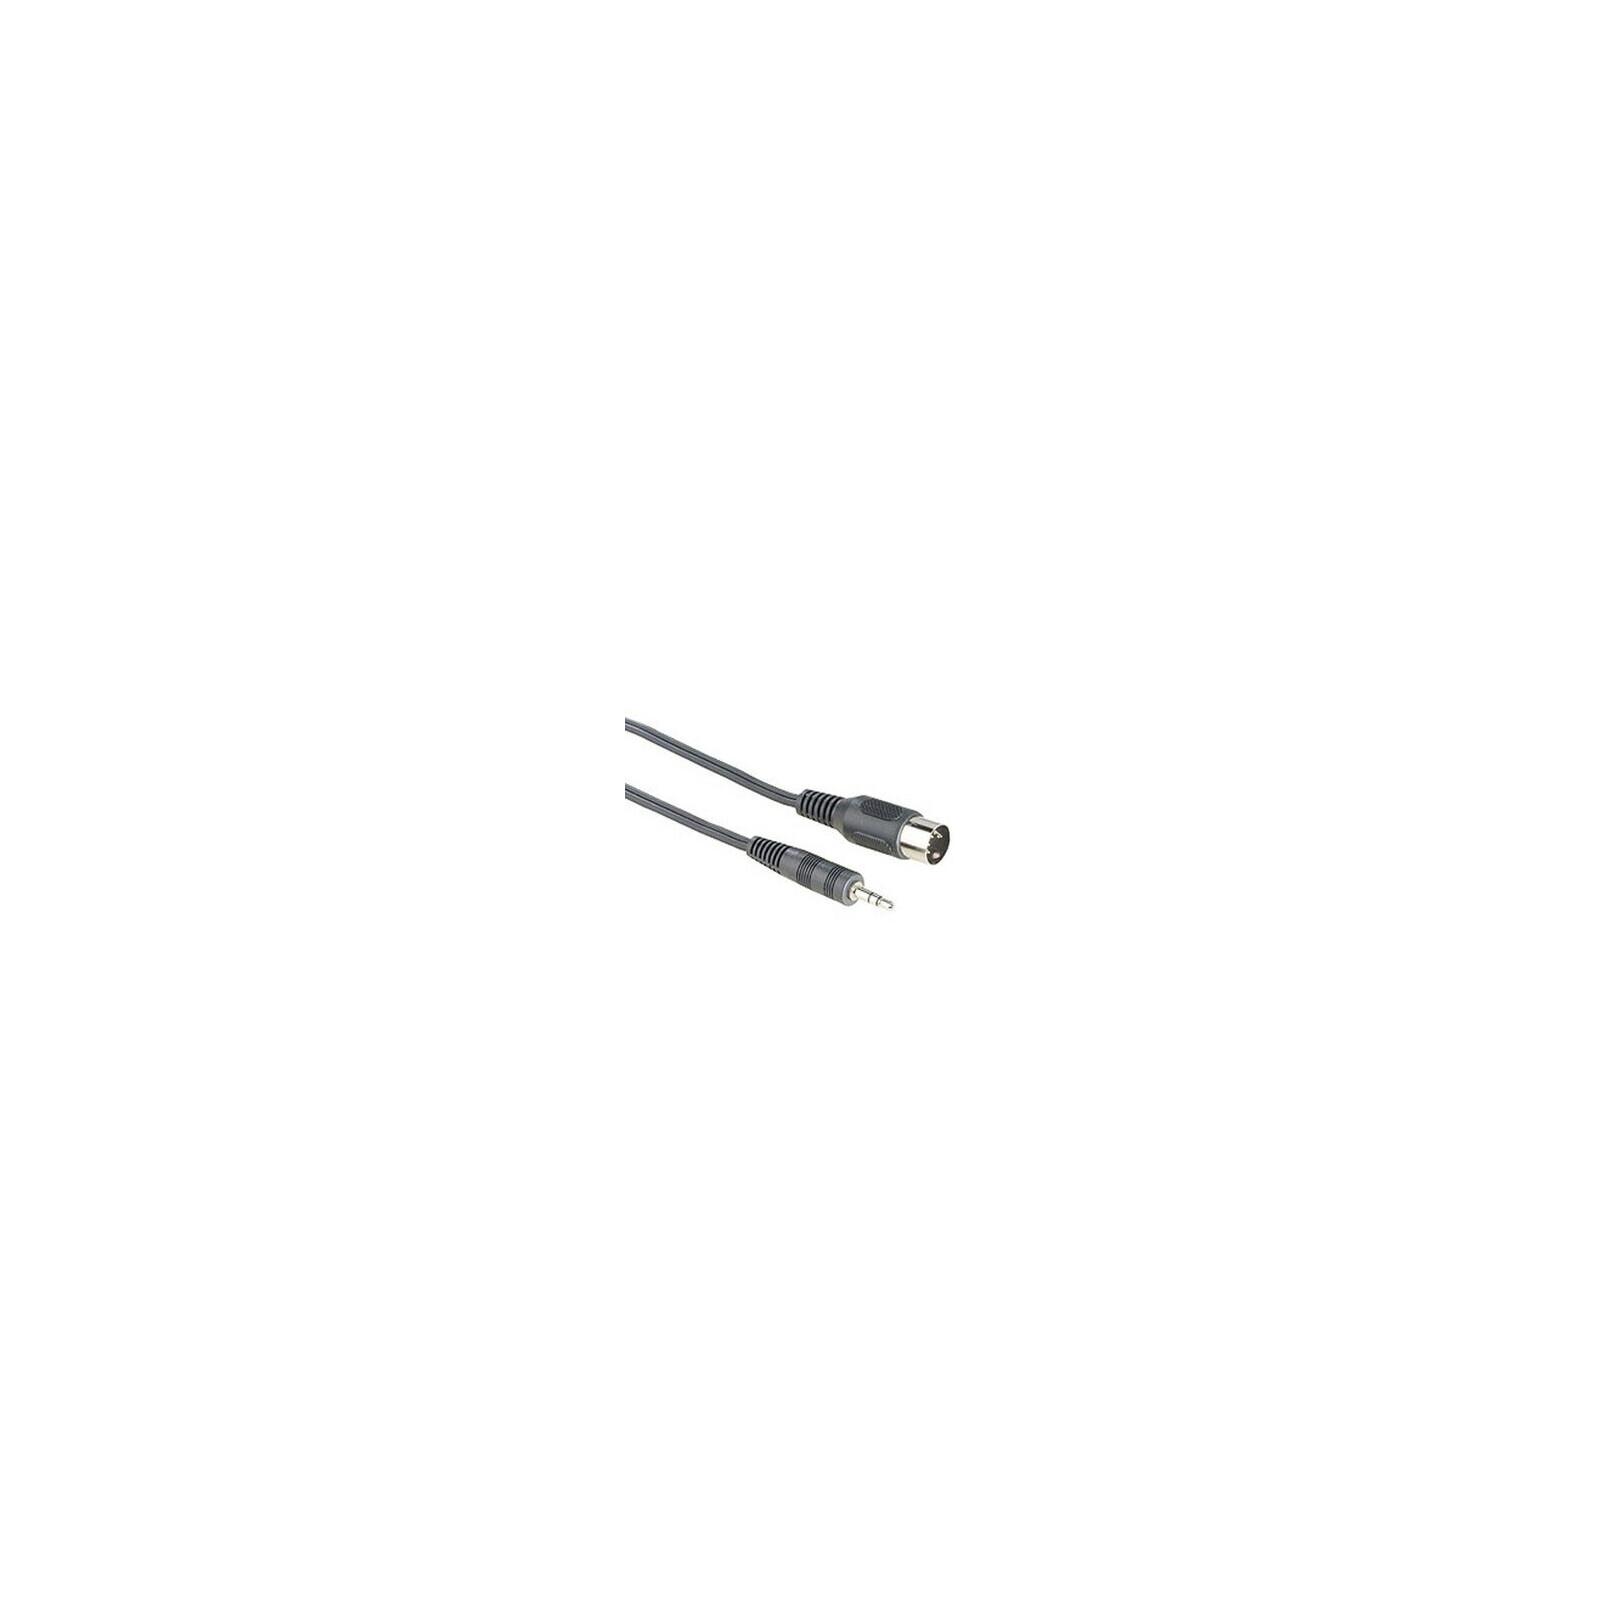 Hama 43347 5-pol.DIN/3,5mm Klinke